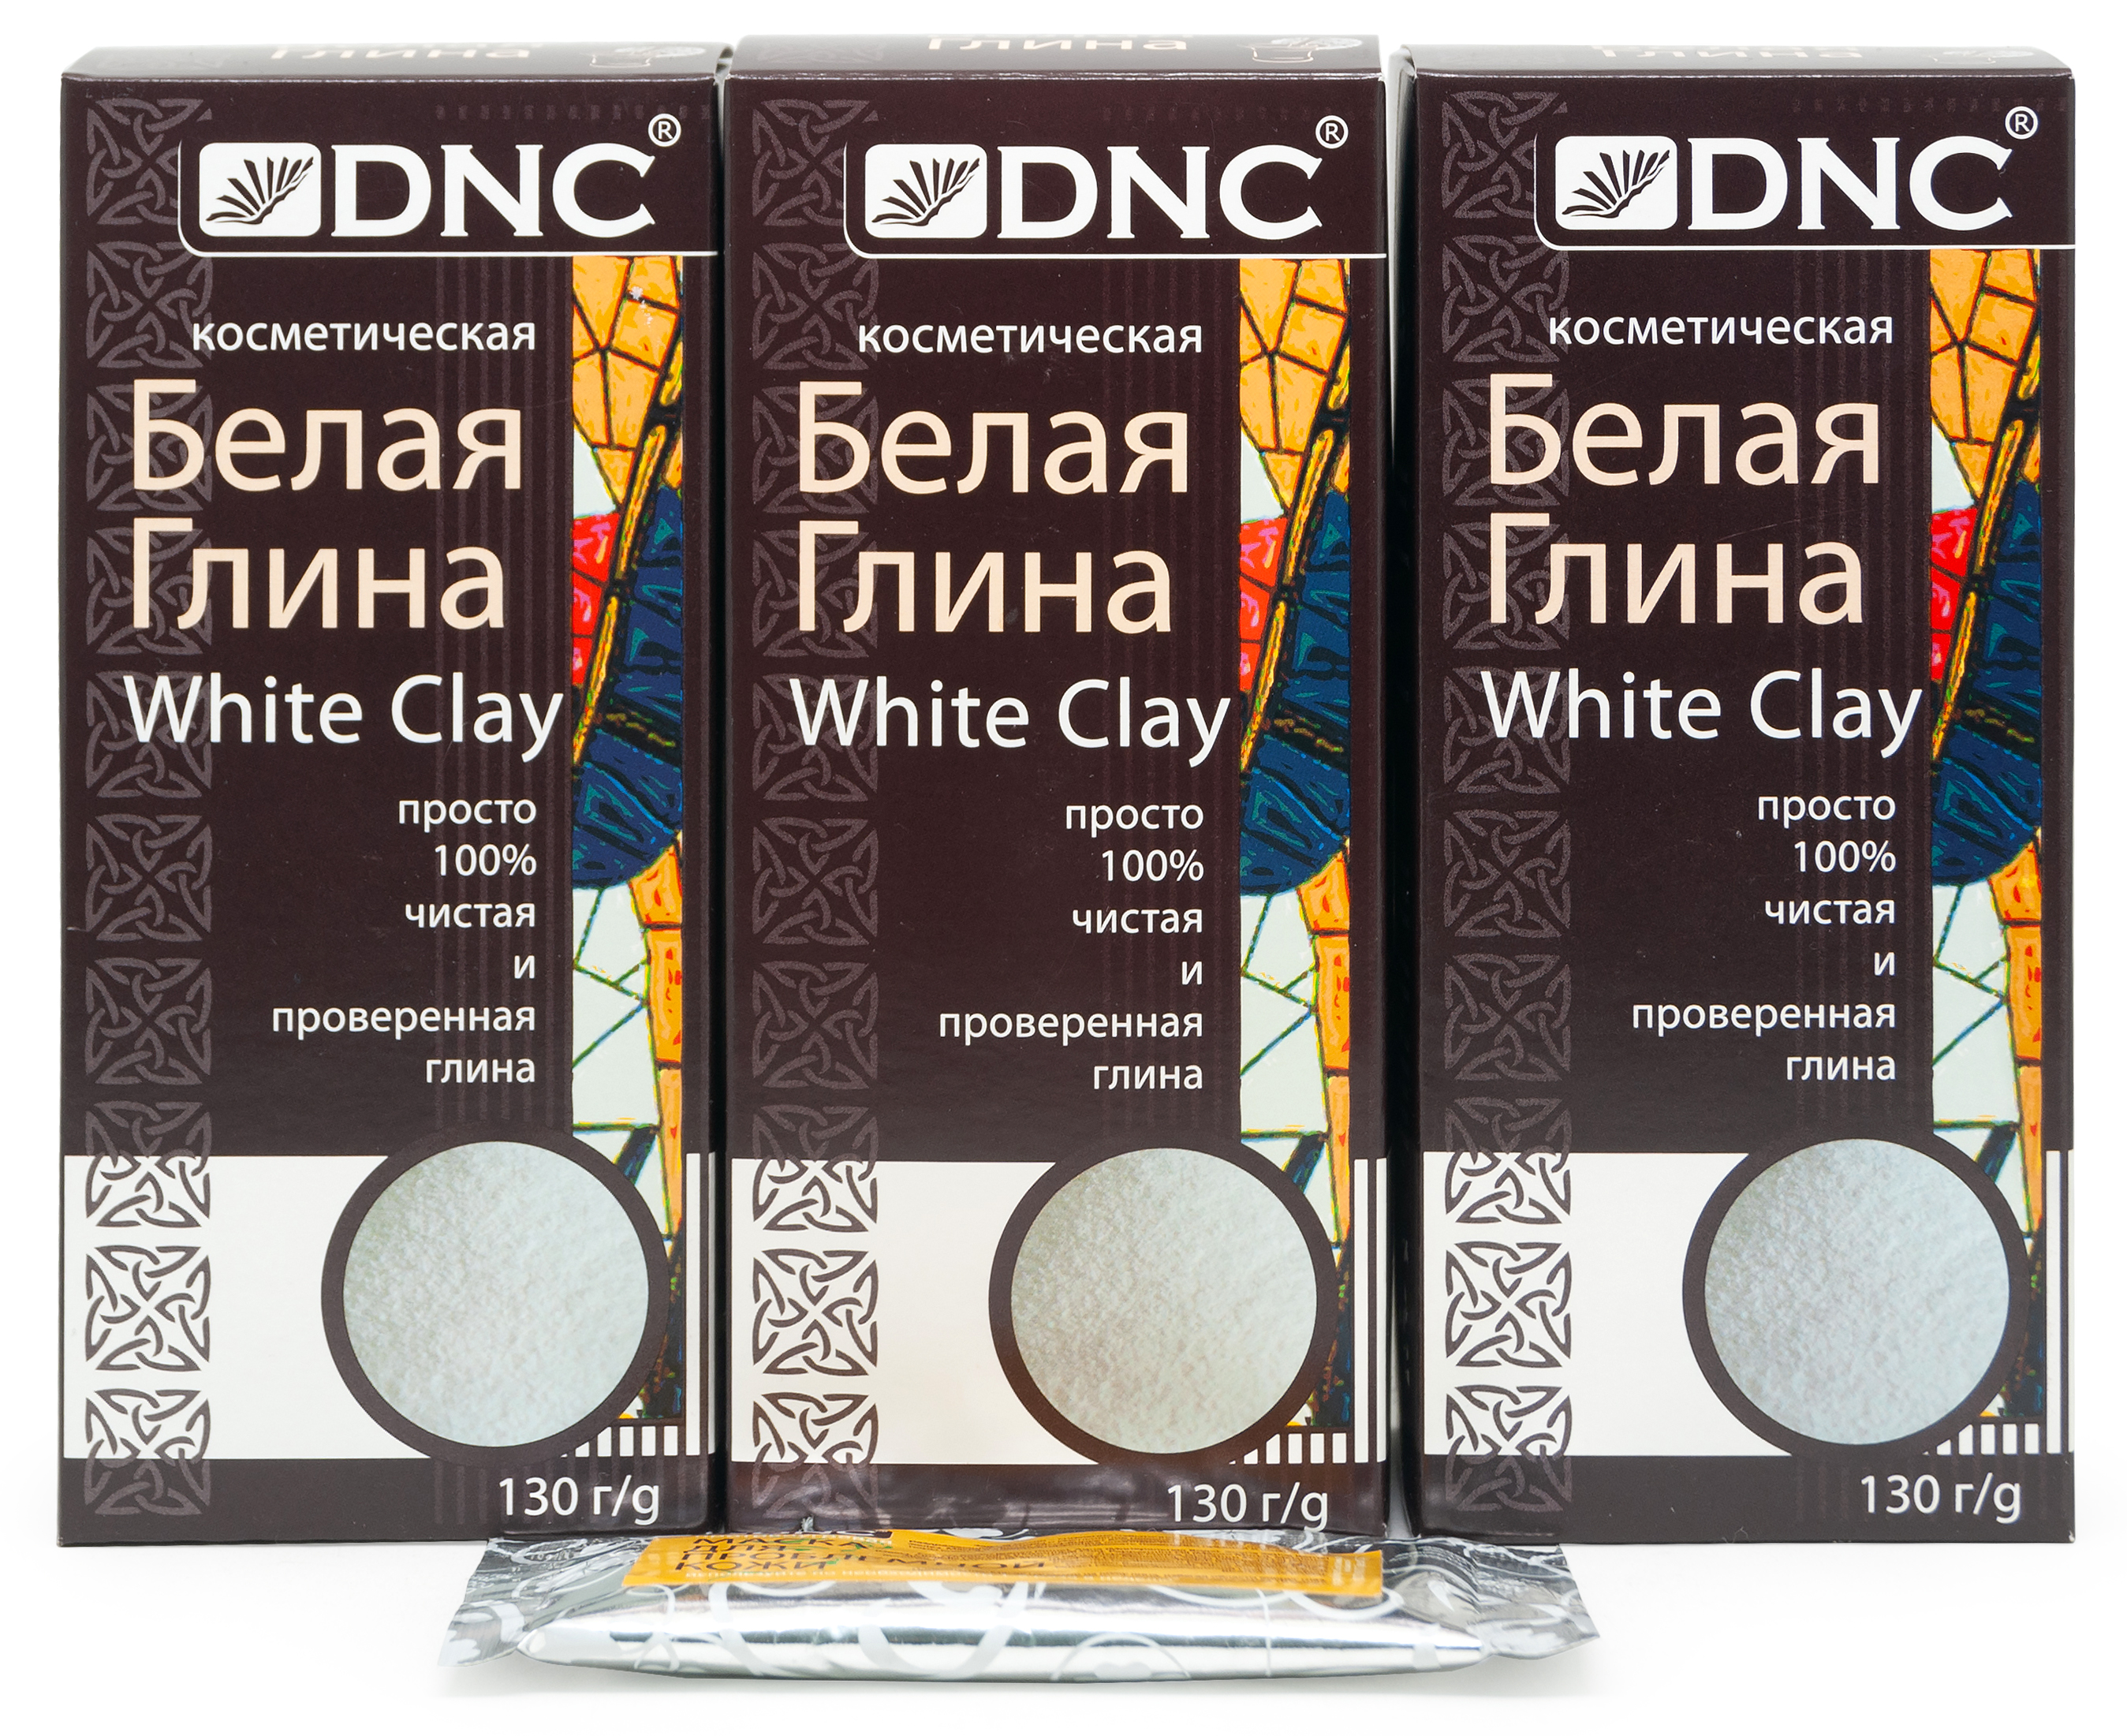 Набор: DNC Глина белая 130 г * 3 шт + Подарок Маска для лица 15 мл